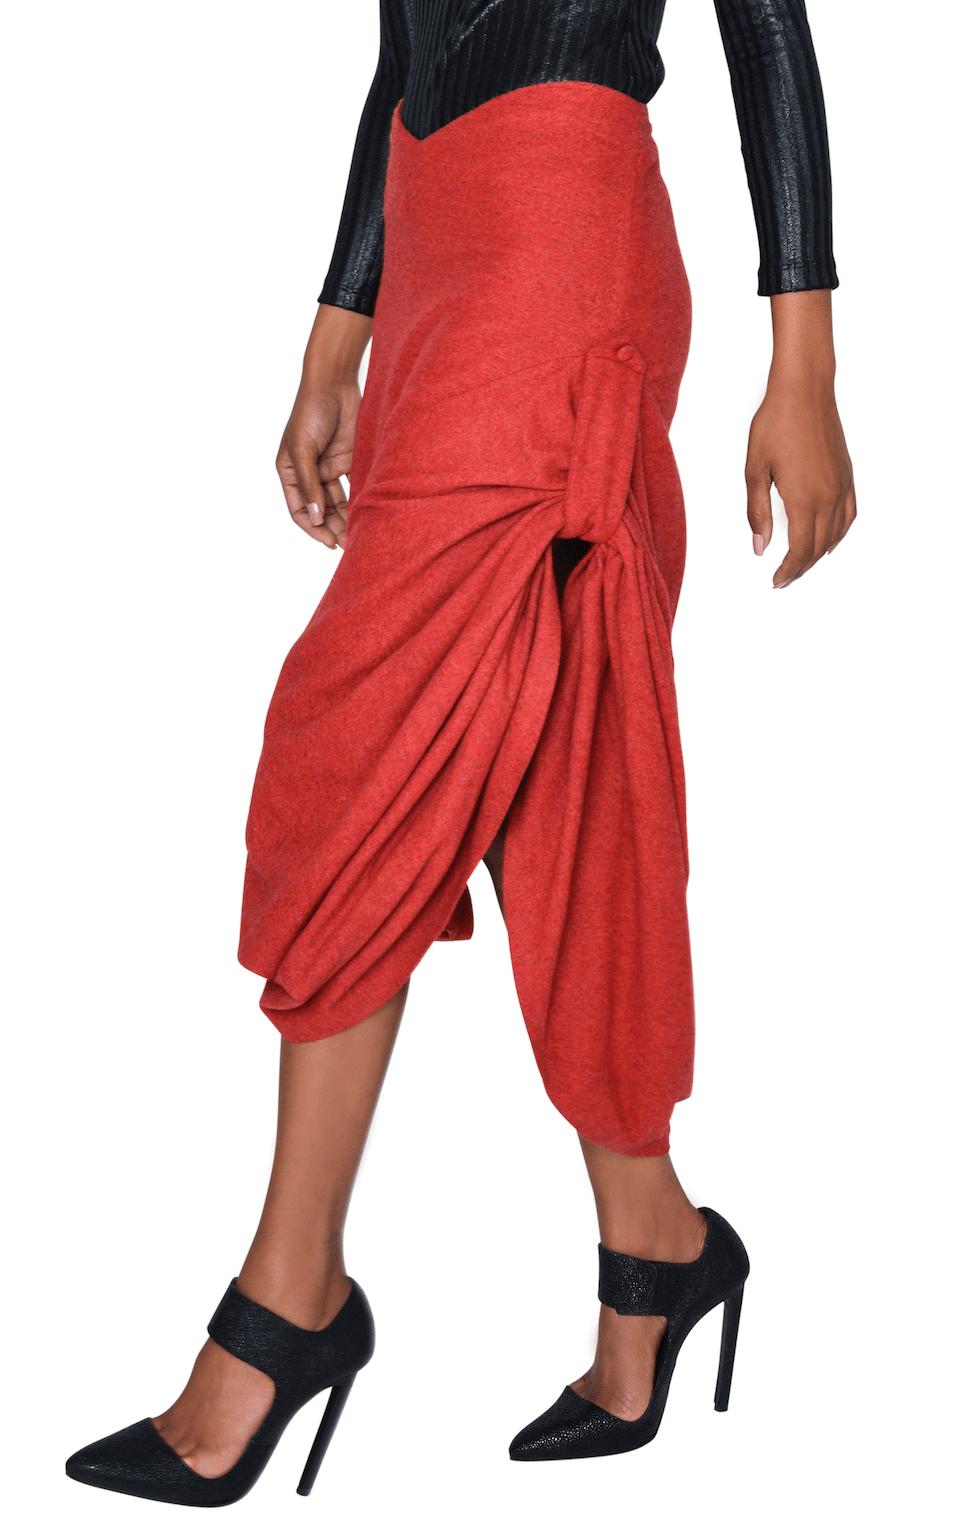 Skirt PLEINE 0